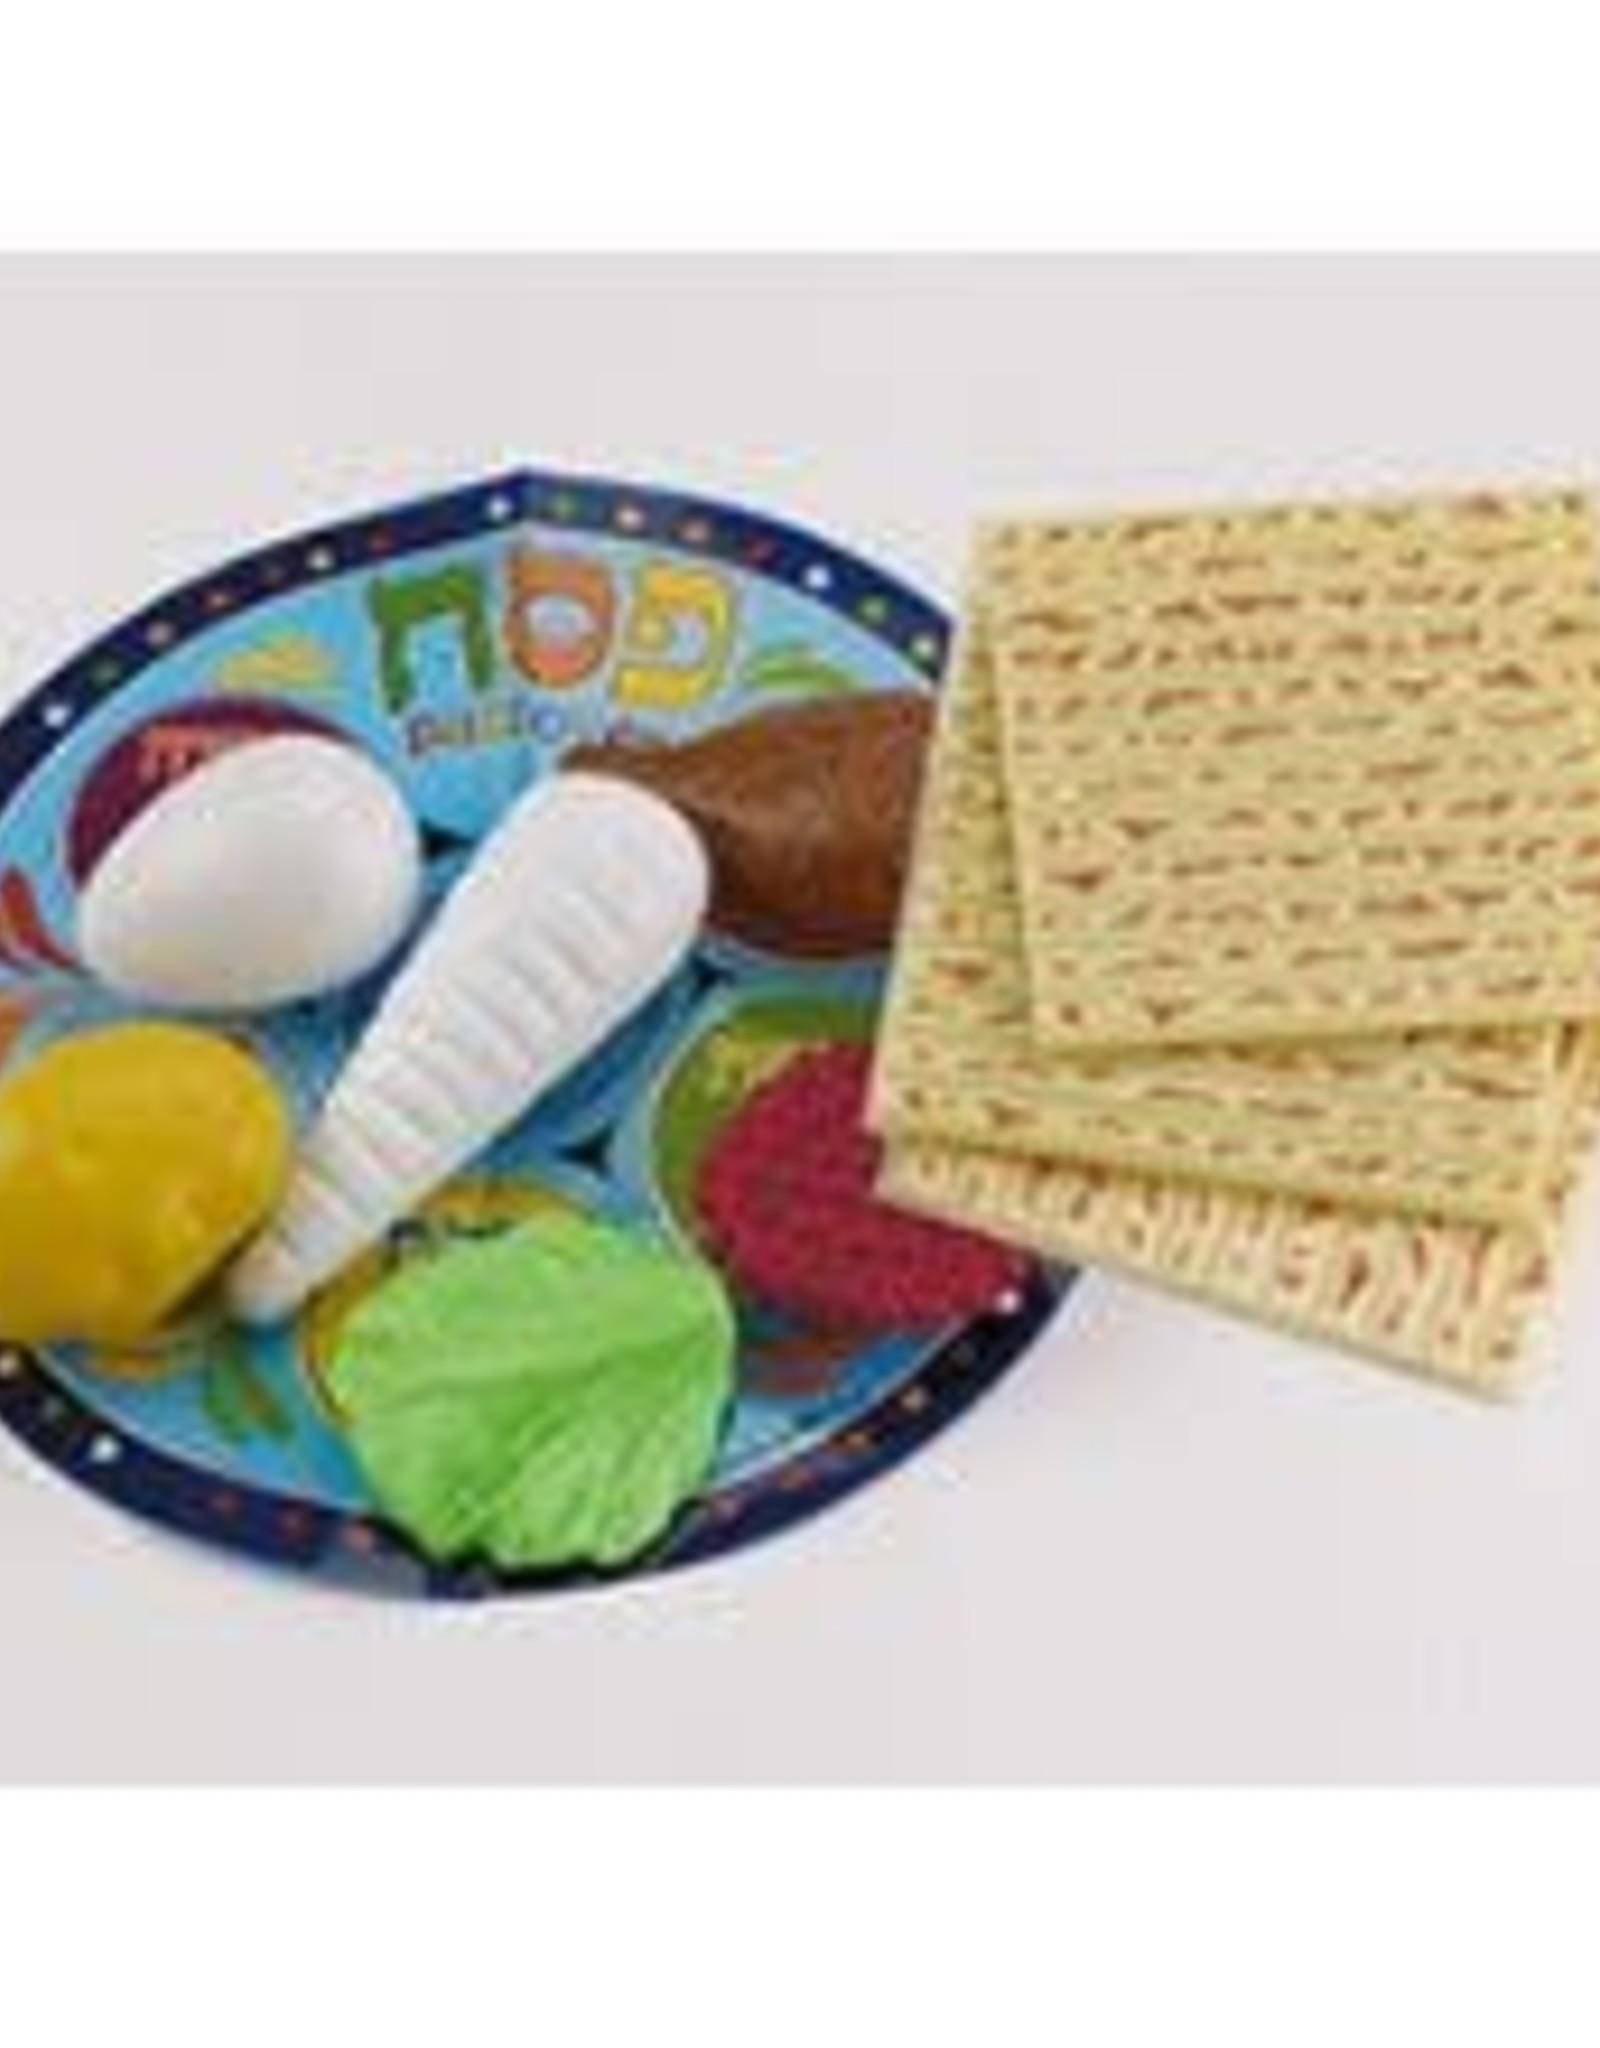 Deluxe Play Seder Set